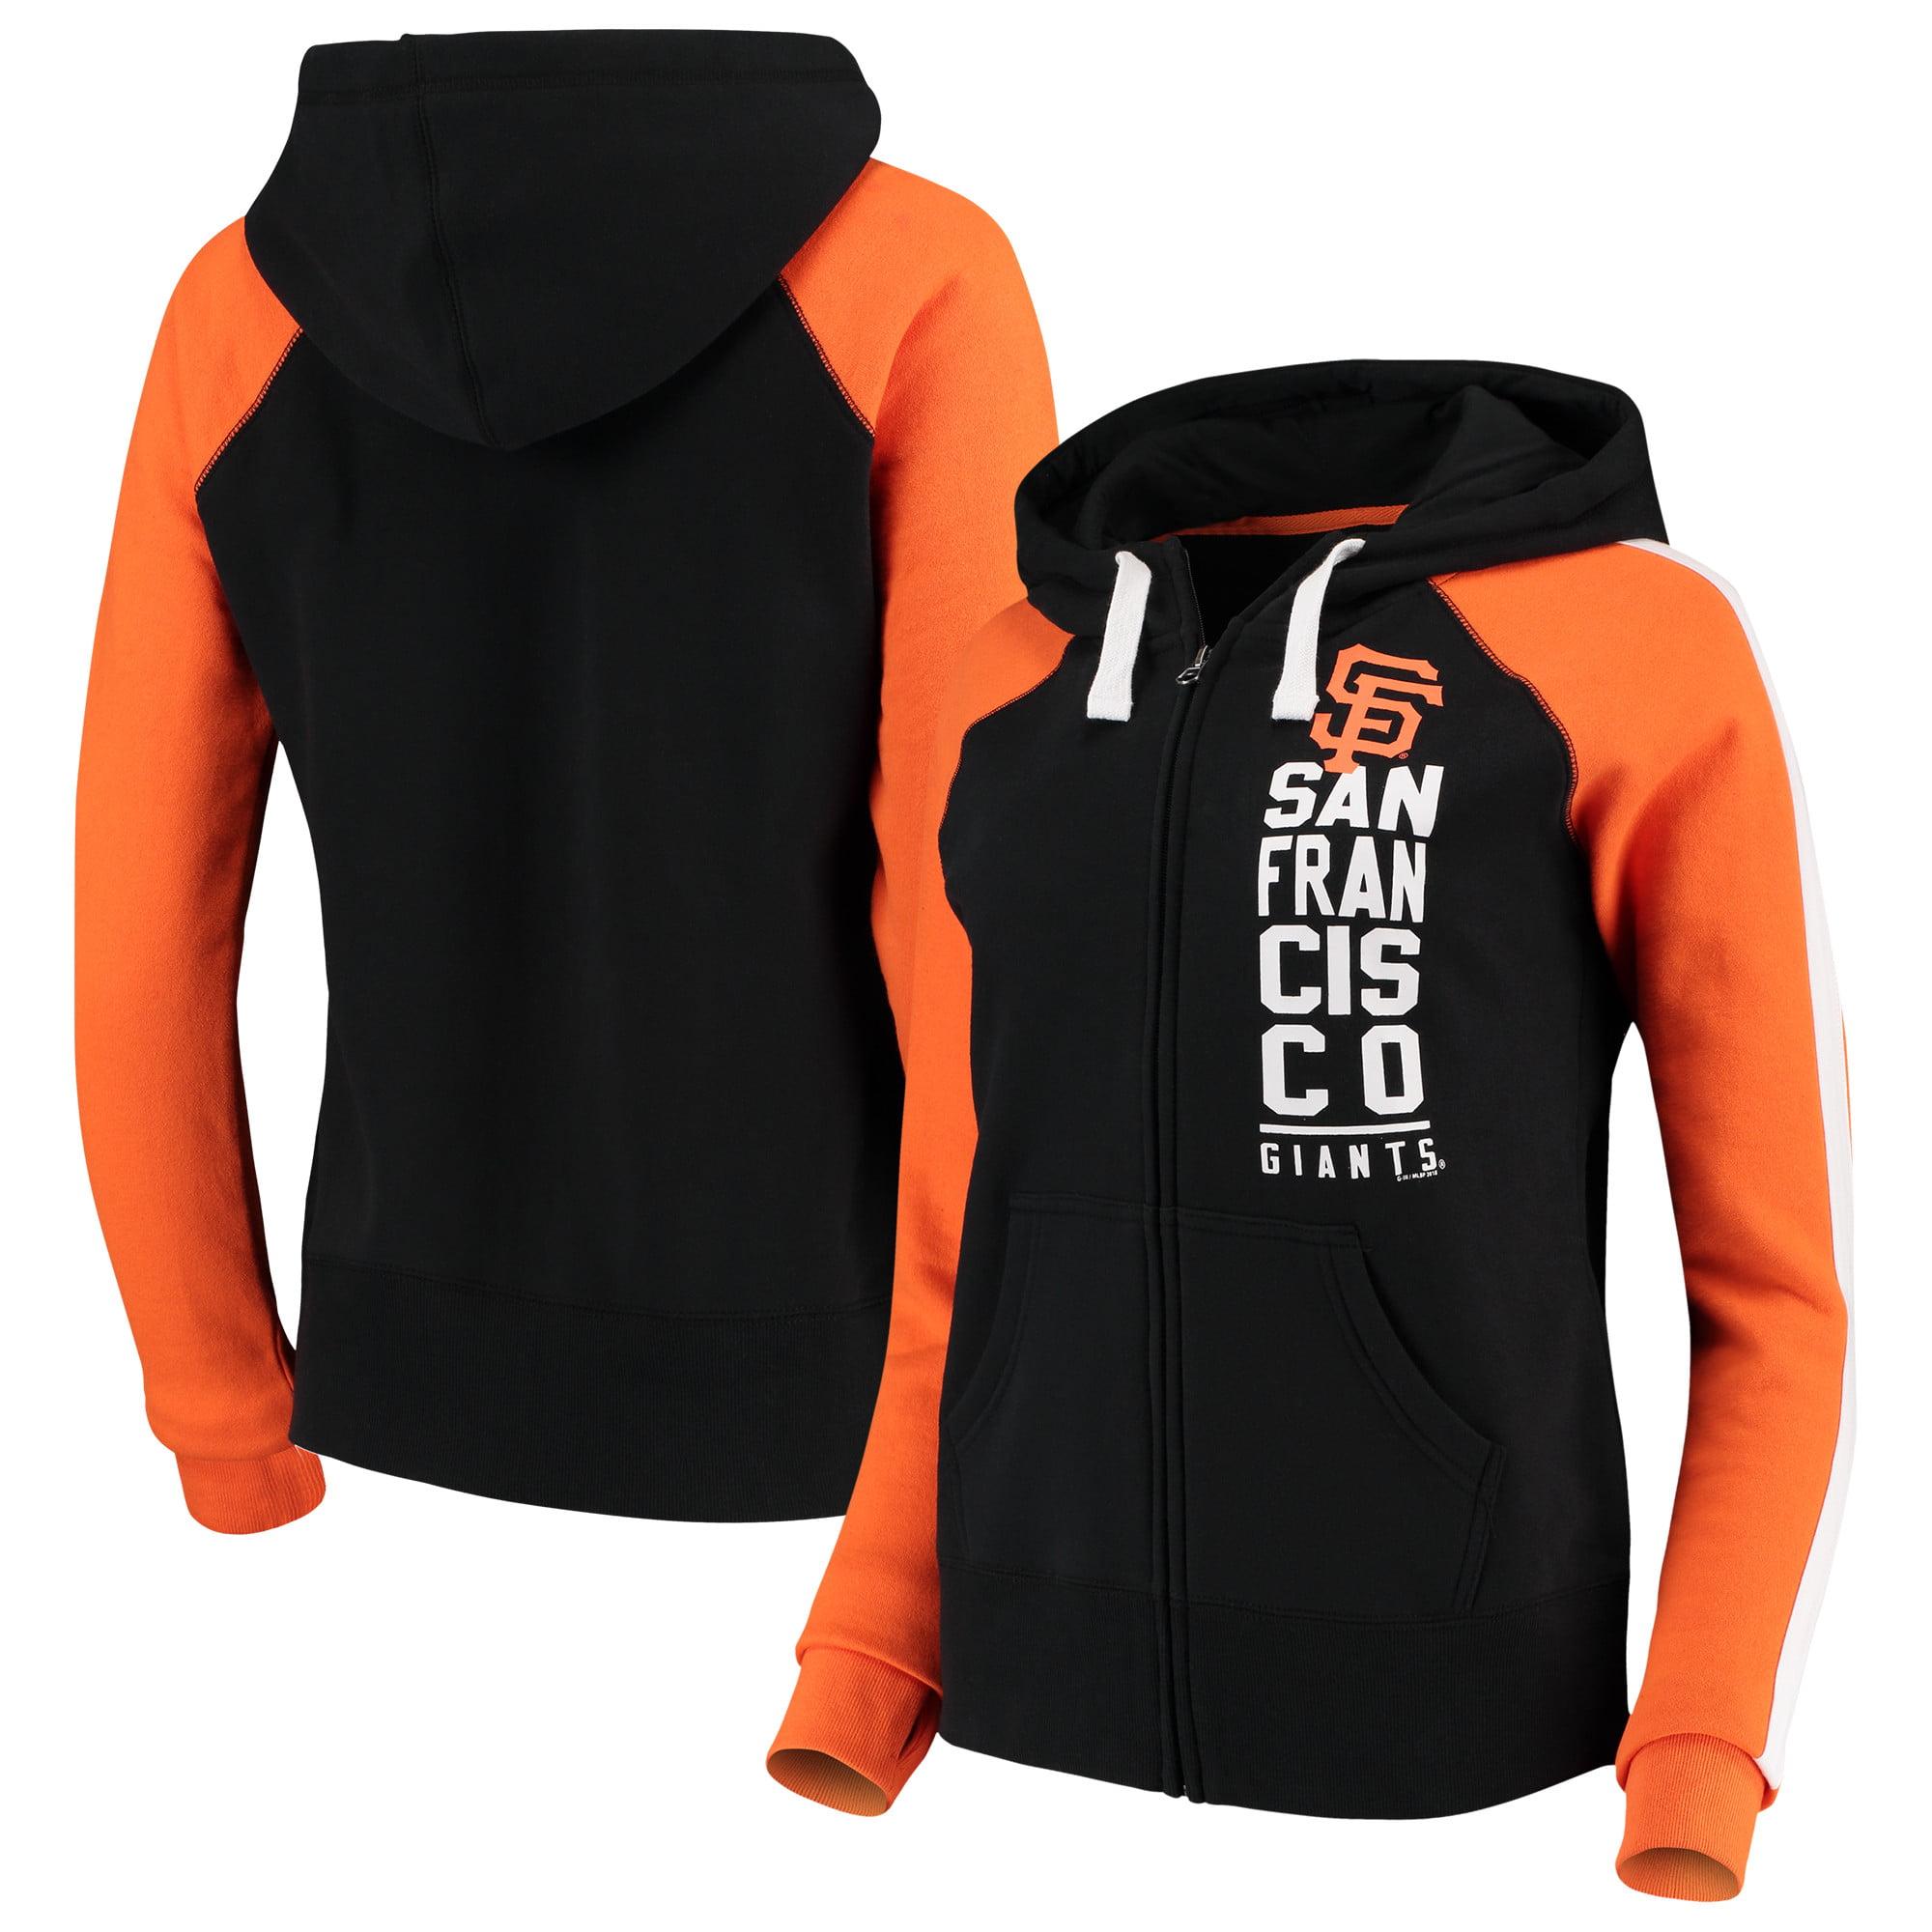 San Francisco Giants G-III 4Her by Carl Banks Women's Game Changer Full-Zip Jacket - Black/Orange